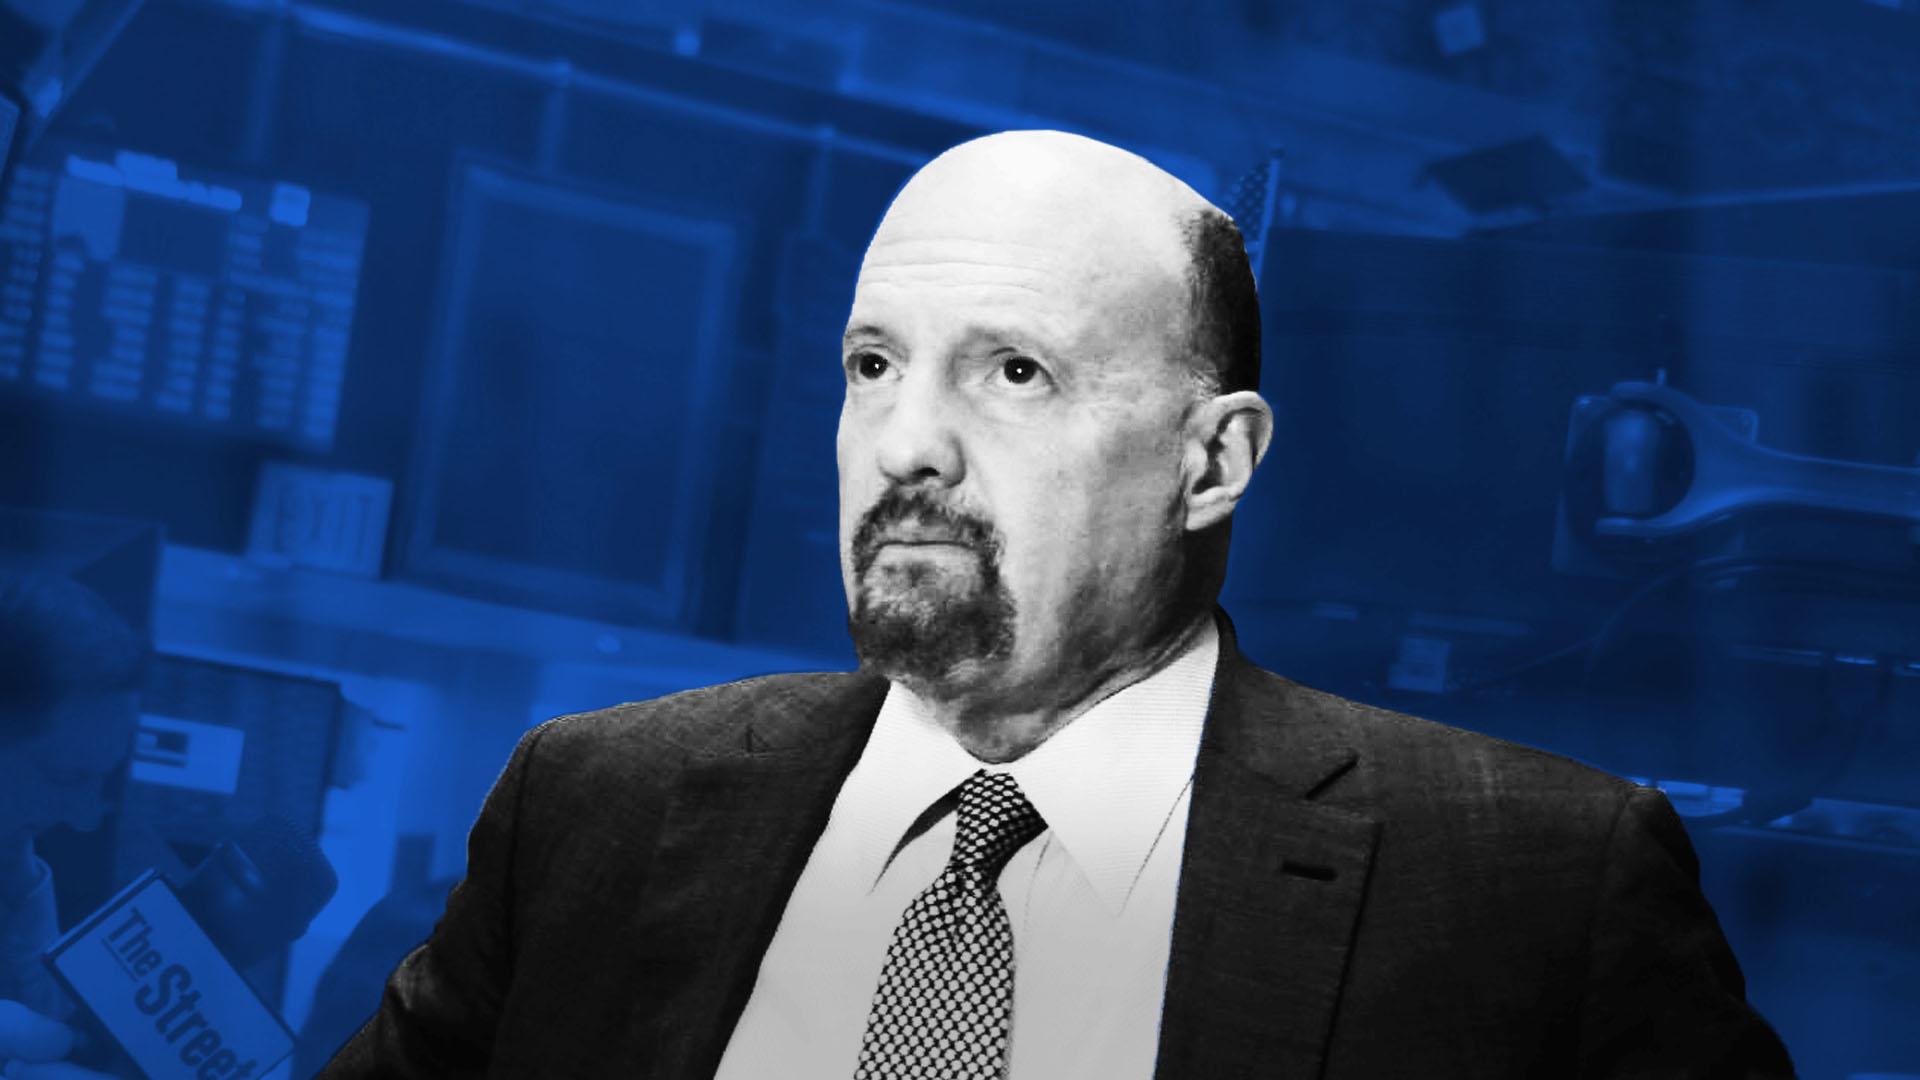 Let's Talk Stocks: Jim Cramer on Salesforce, Halliburton, Uber and Peloton